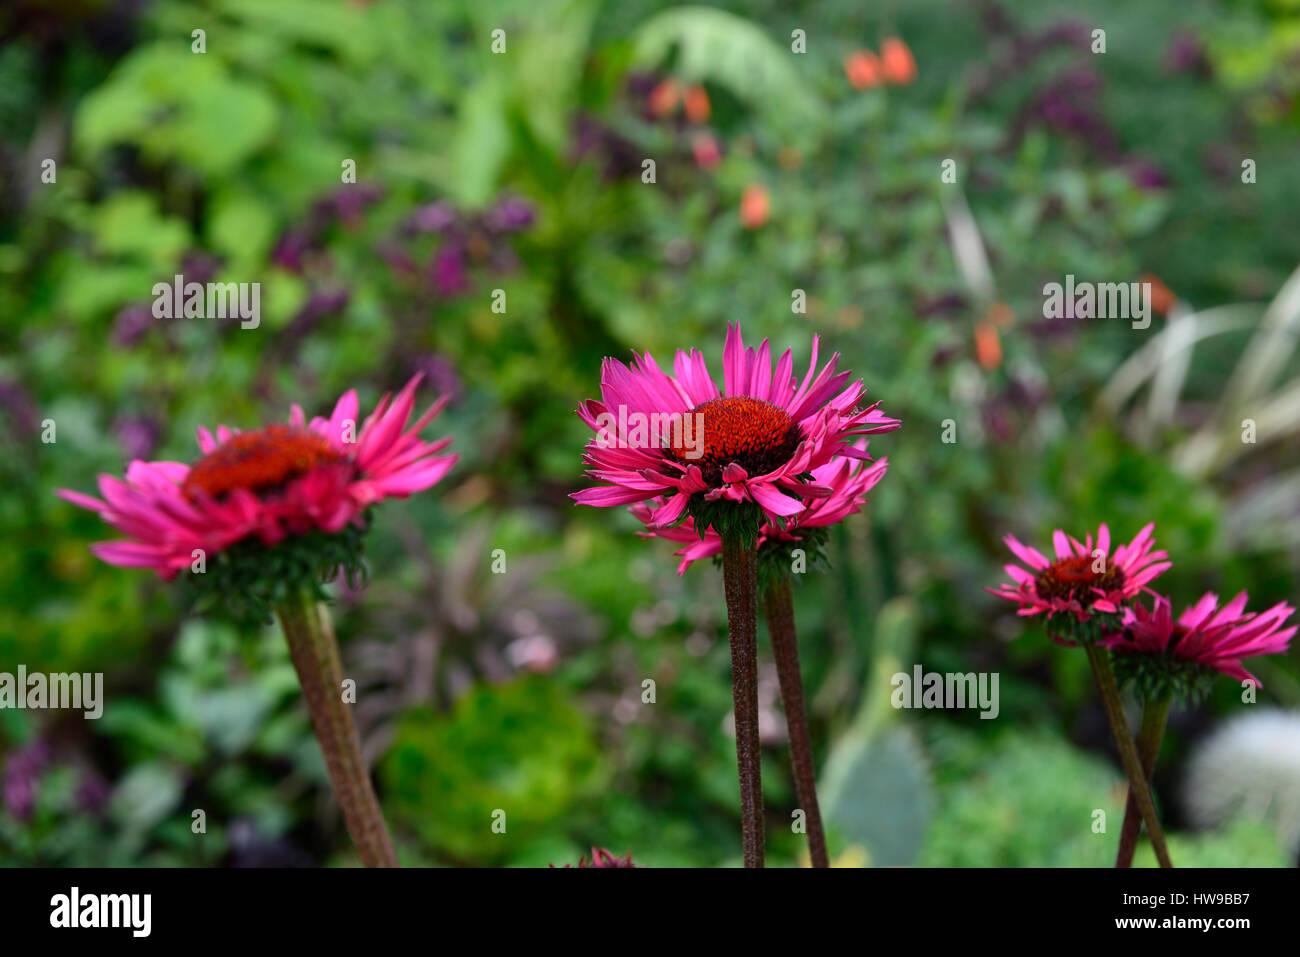 Echinacea purpurea ruby giant echinaceas coneflower coneflowers echinacea purpurea ruby giant echinaceas coneflower coneflowers red purple flower flowers flowering perennial rm floral mightylinksfo